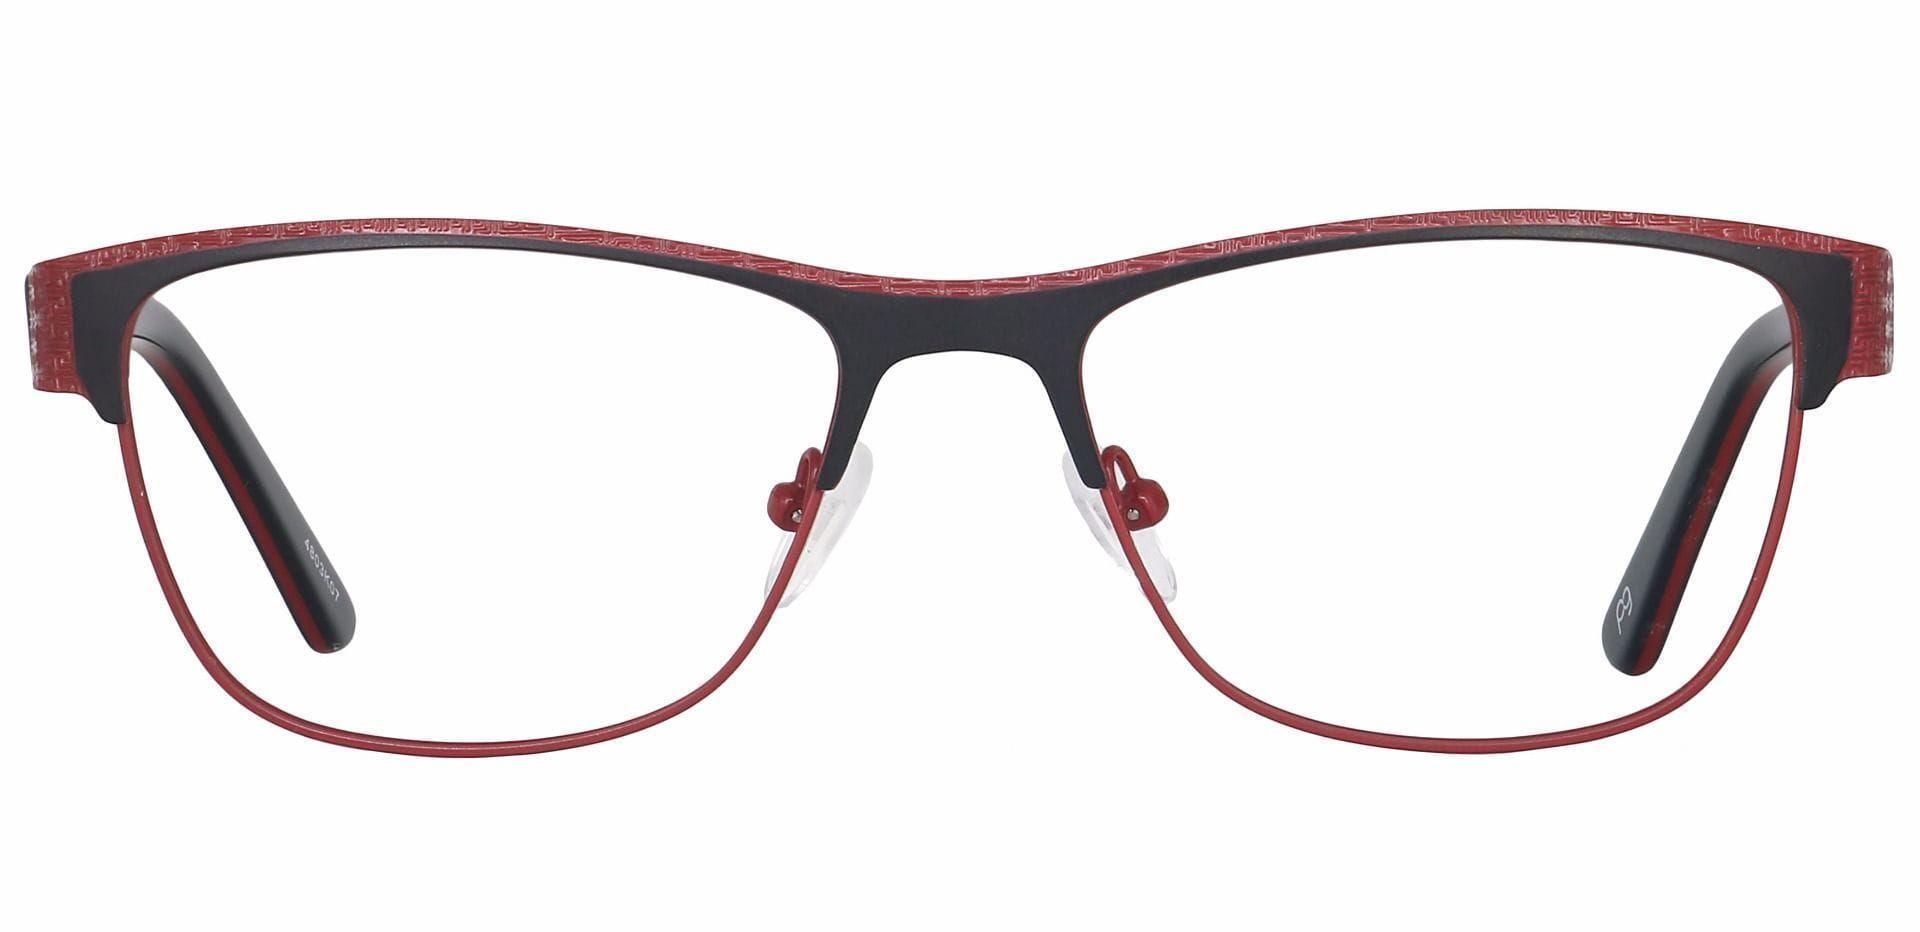 Ama Oval Progressive Glasses - Red